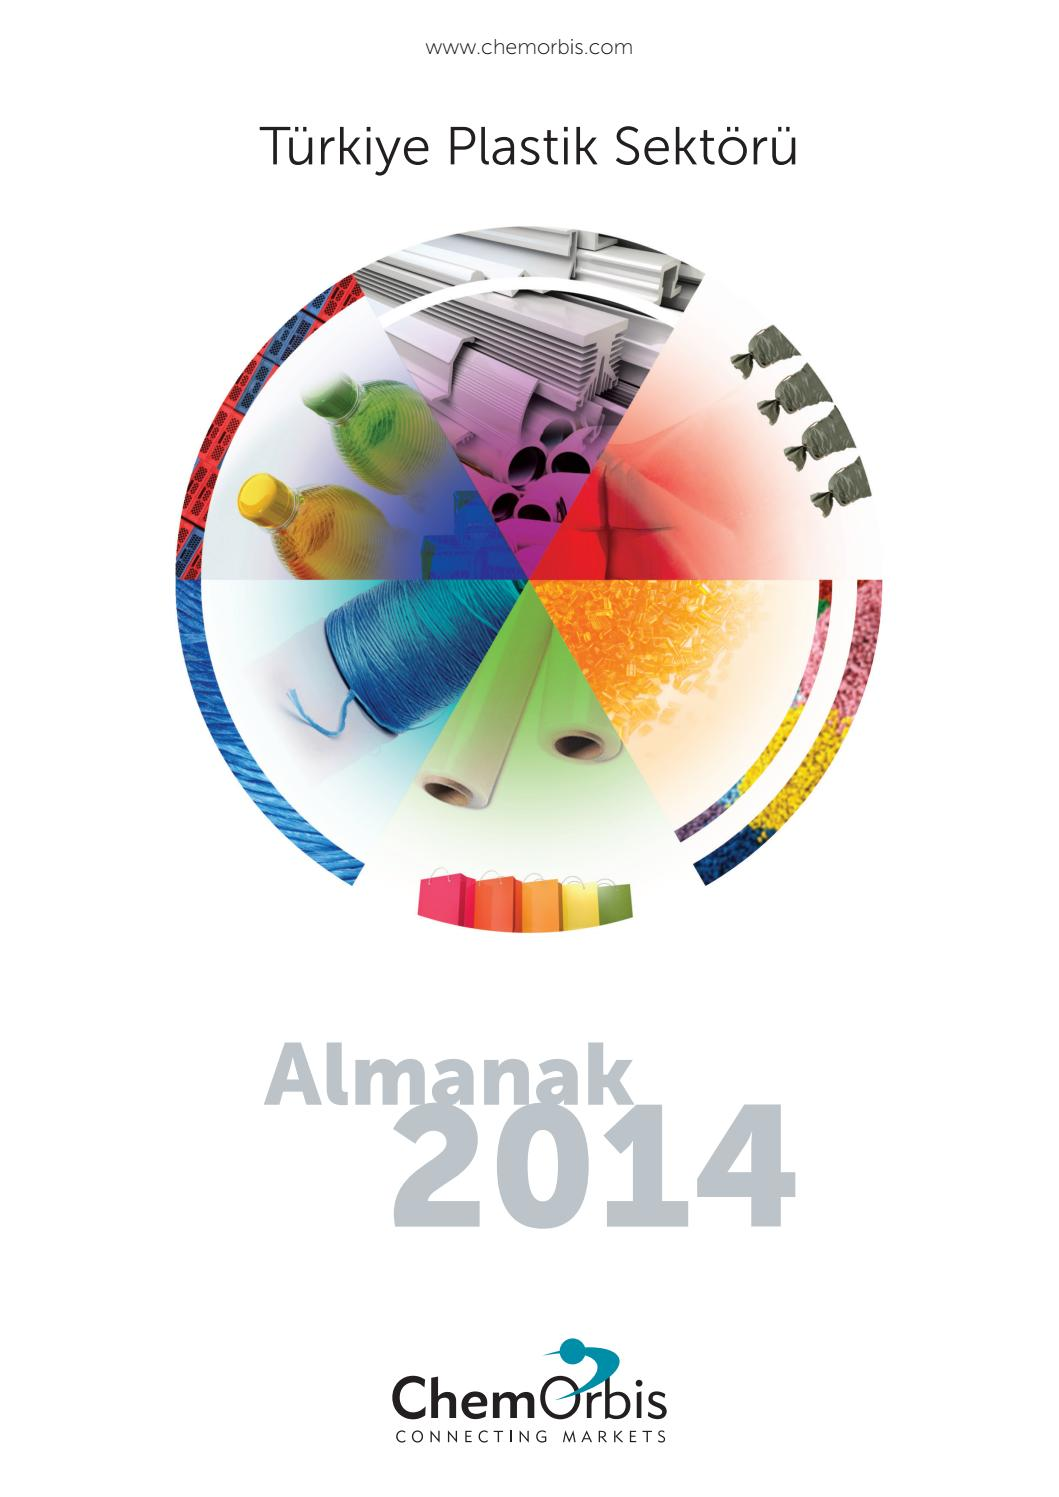 Chemorbis Turkey Plastics Industry Almanac 2014 By Chemorbis Issuu